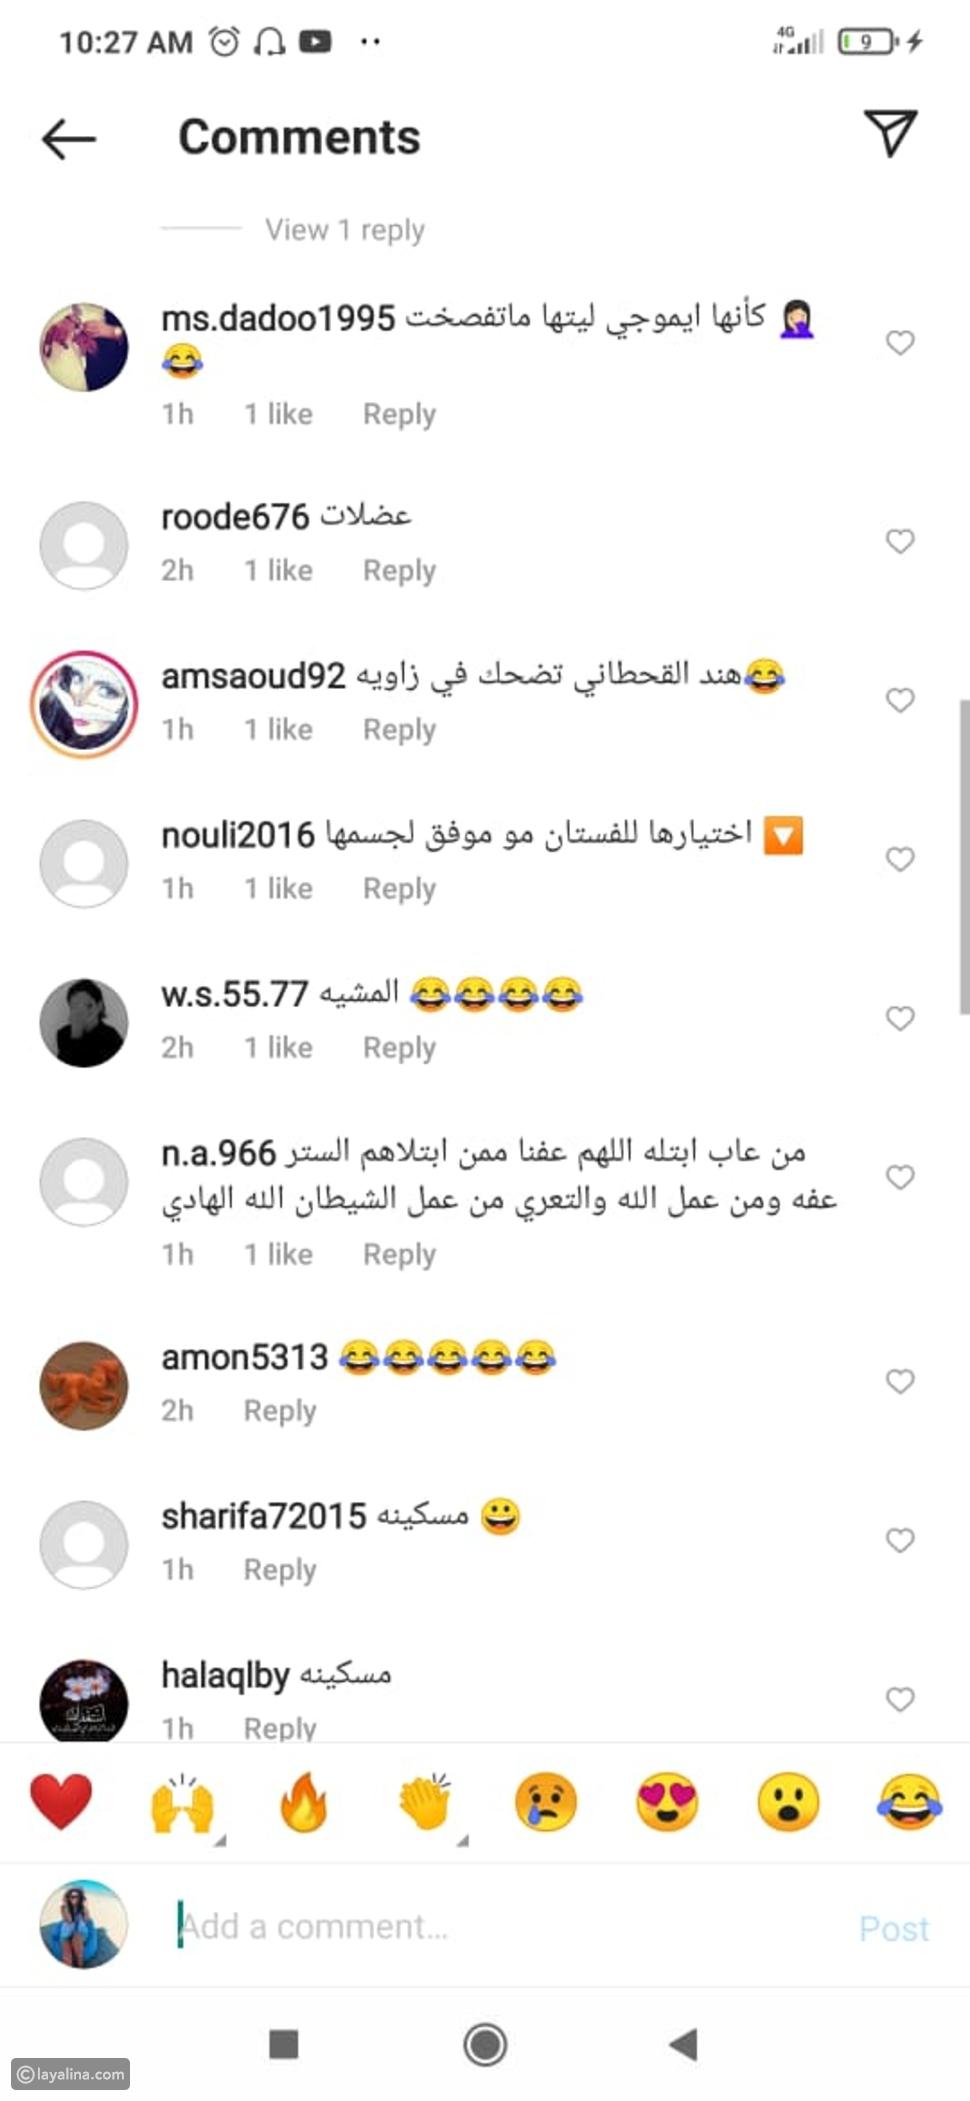 بدور البراهيم تستفز متابعيها بفستان جريء وتثير الجدل مجدداً حول حجابها